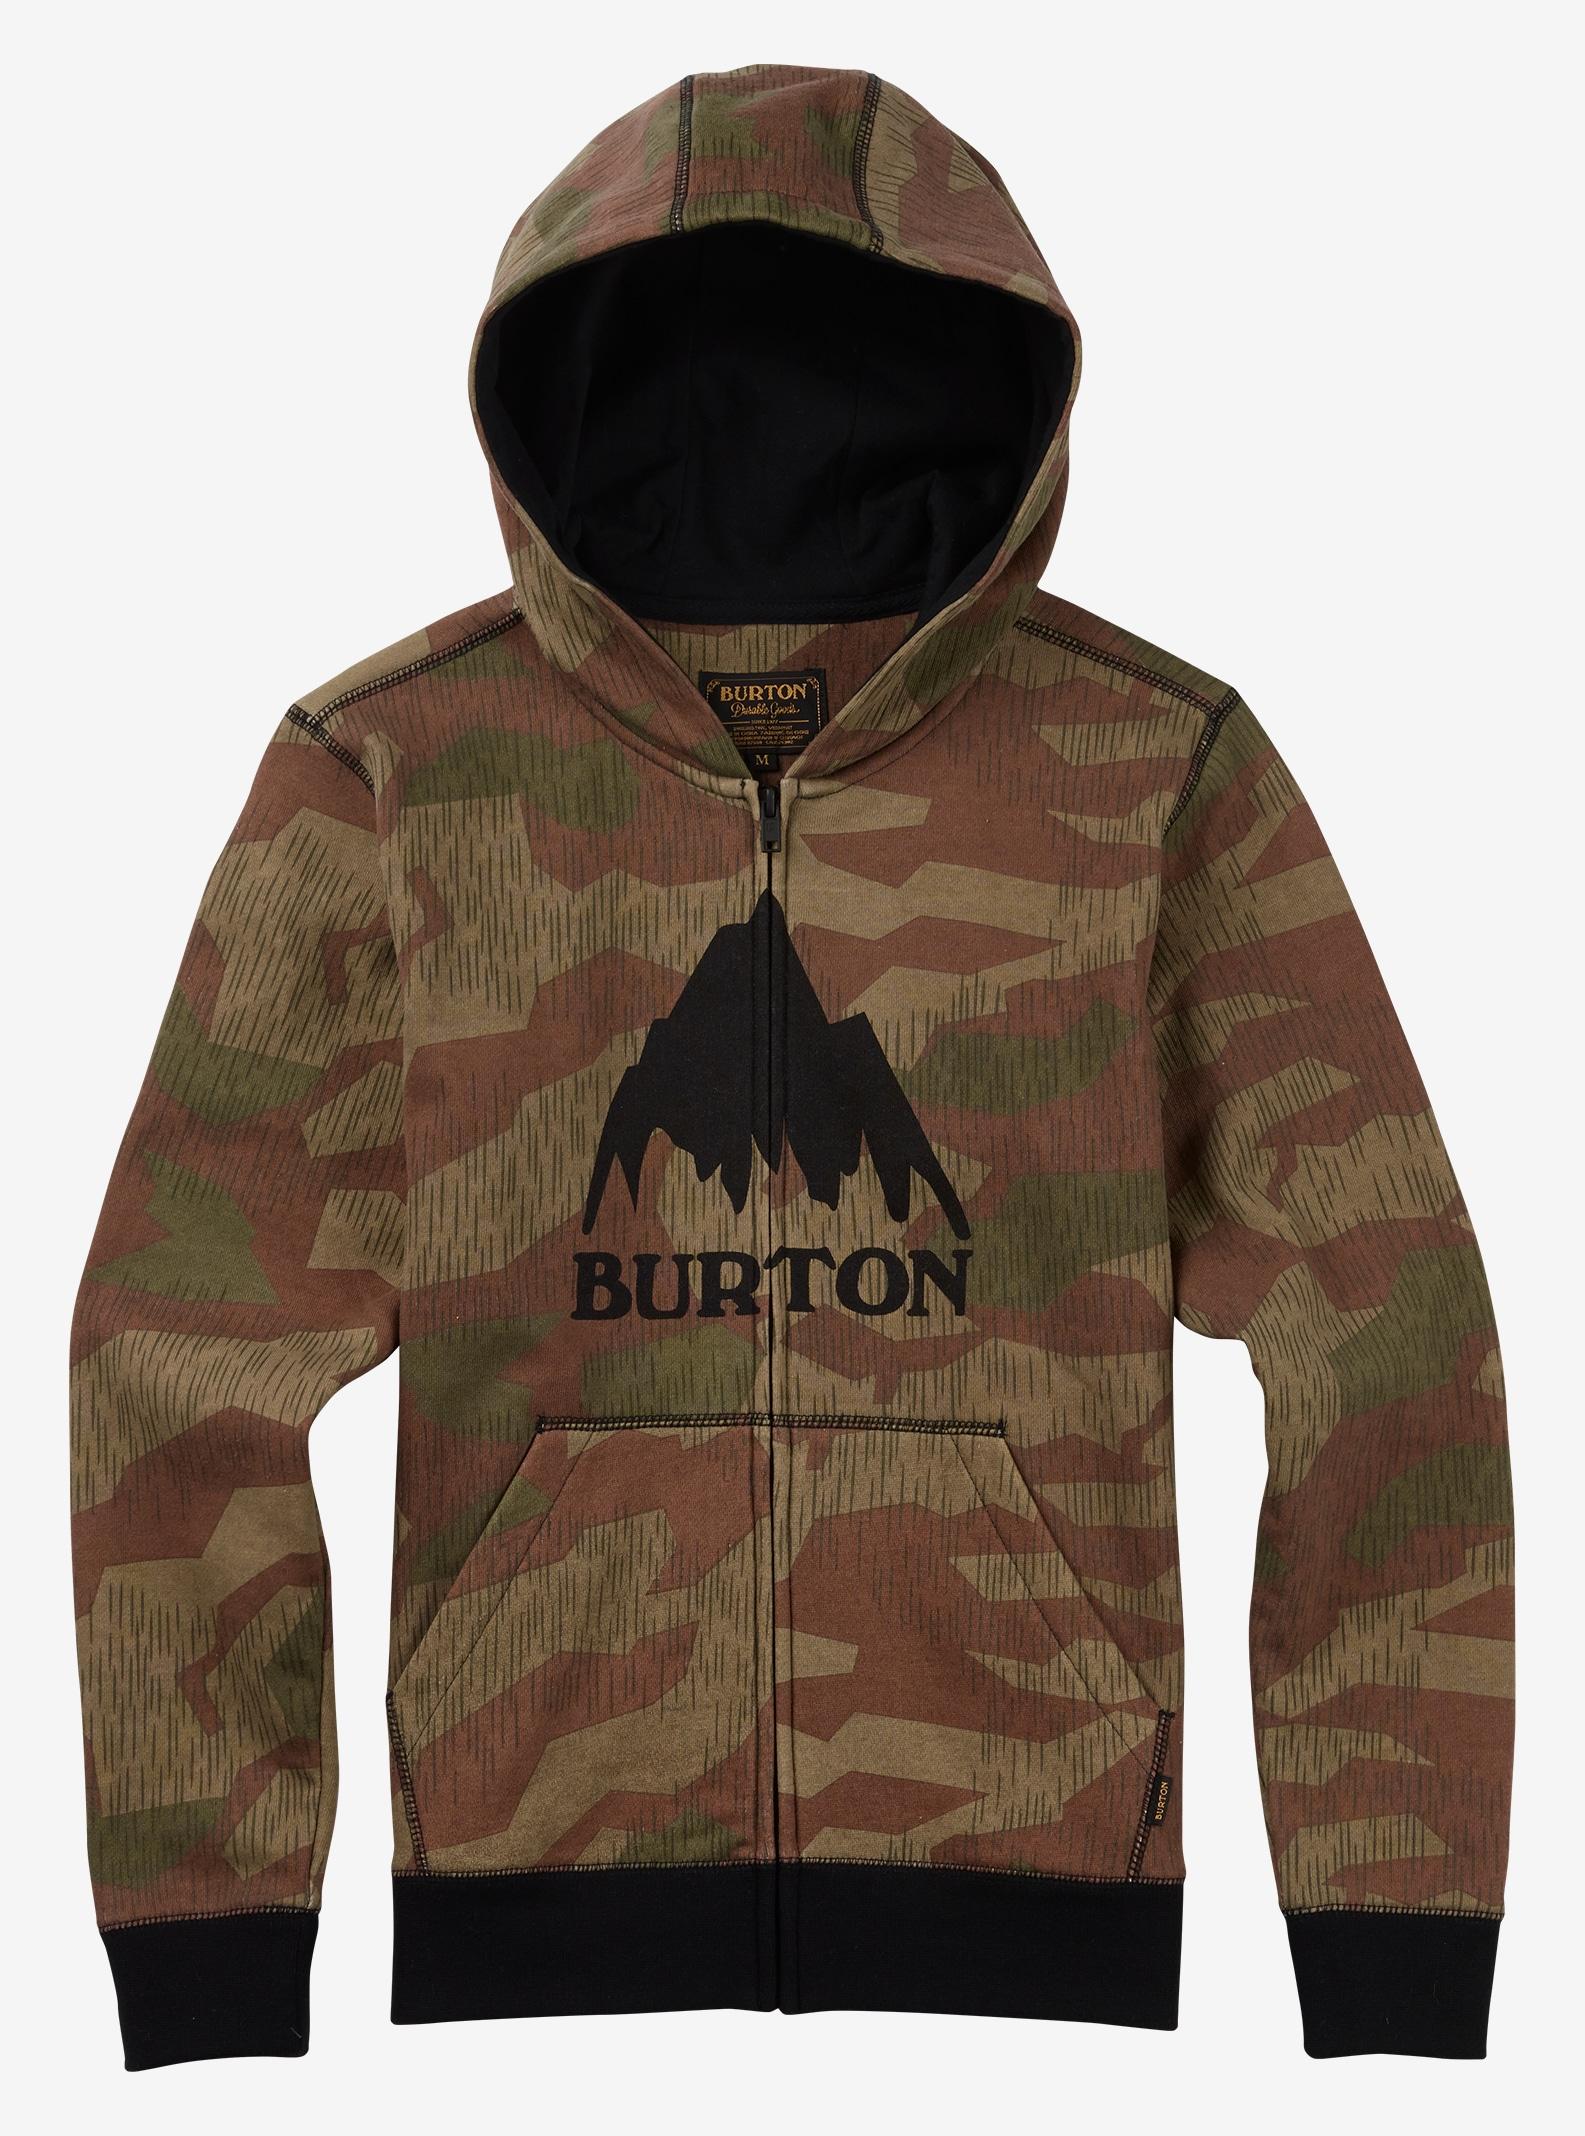 Burton Classic Mountain Full-Zip Hoodie shown in Splinter Camo